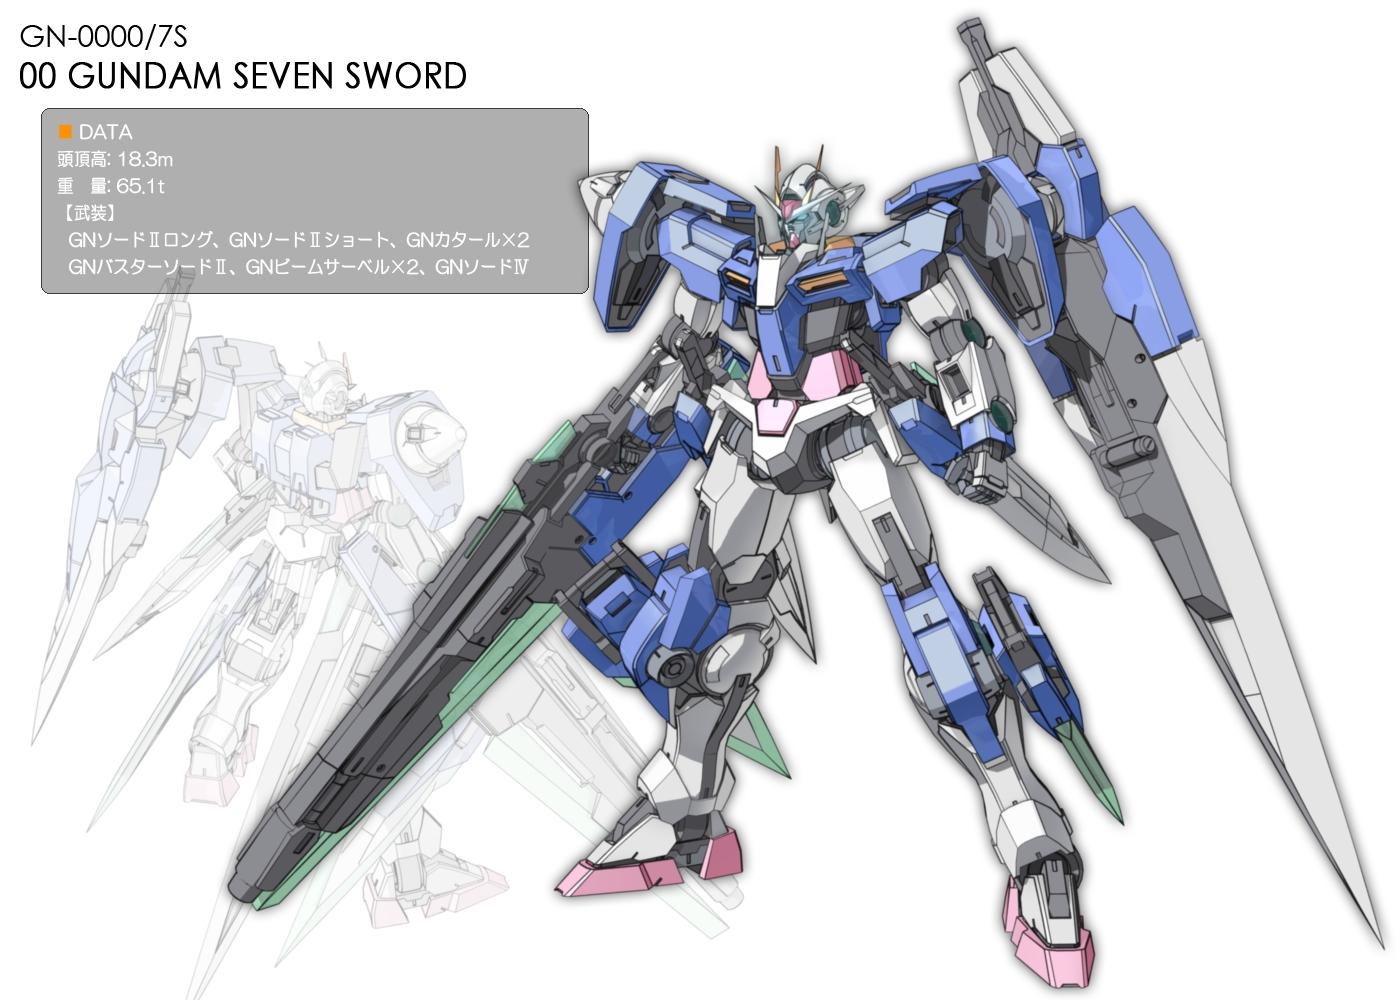 Image - 00 Gundam 7S wallpaper...